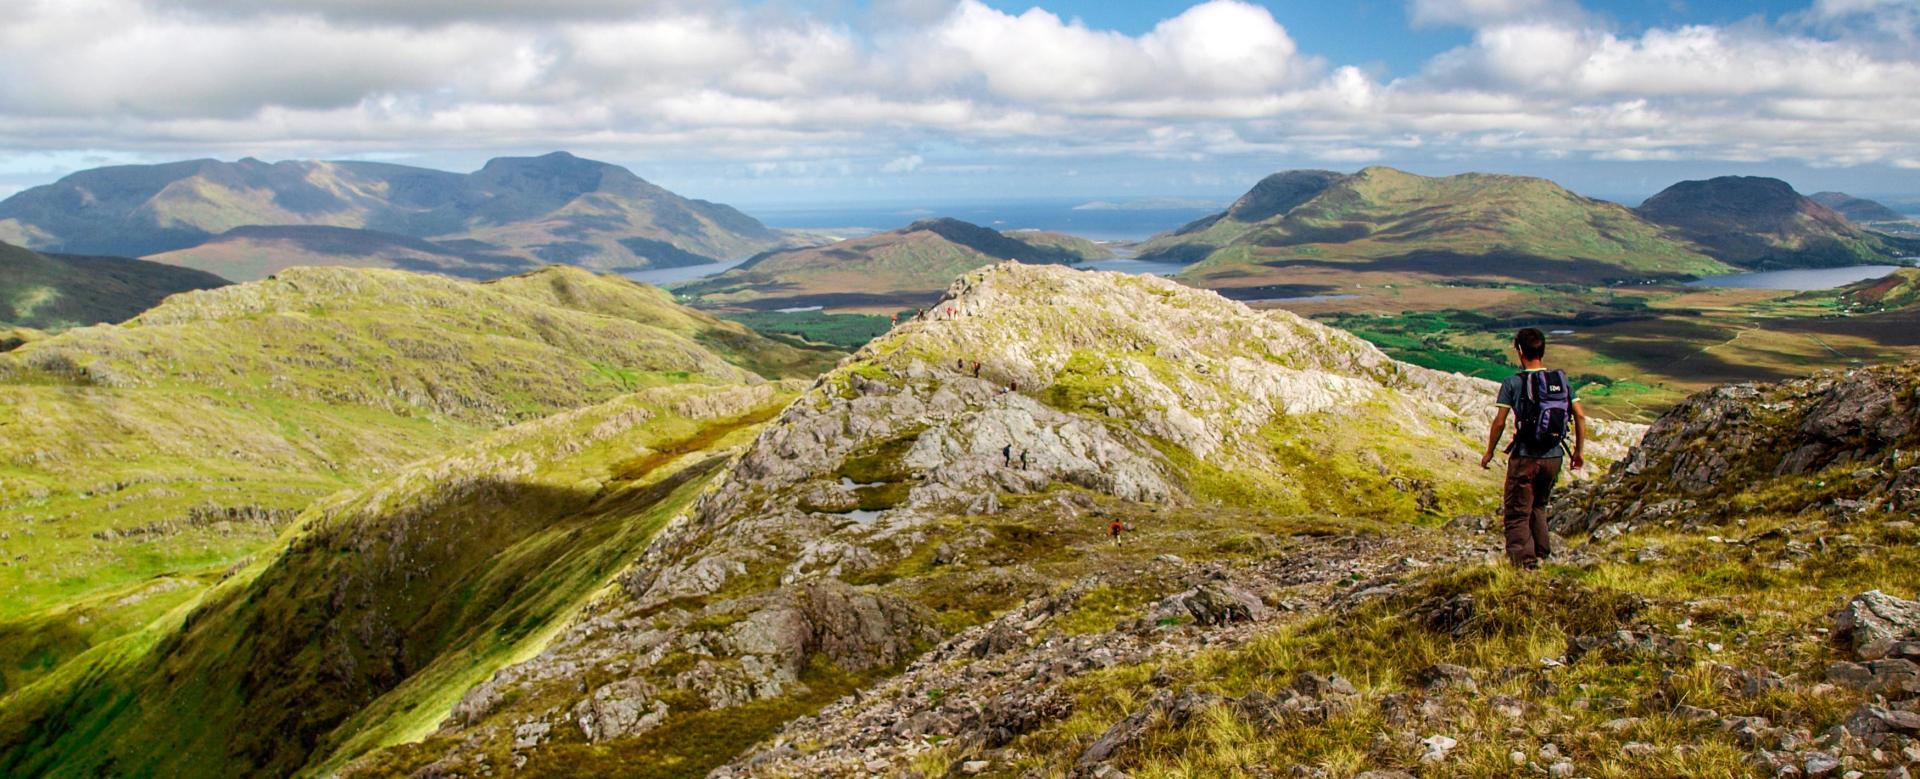 Voyage à pied Irlande : La grande balade irlandaise